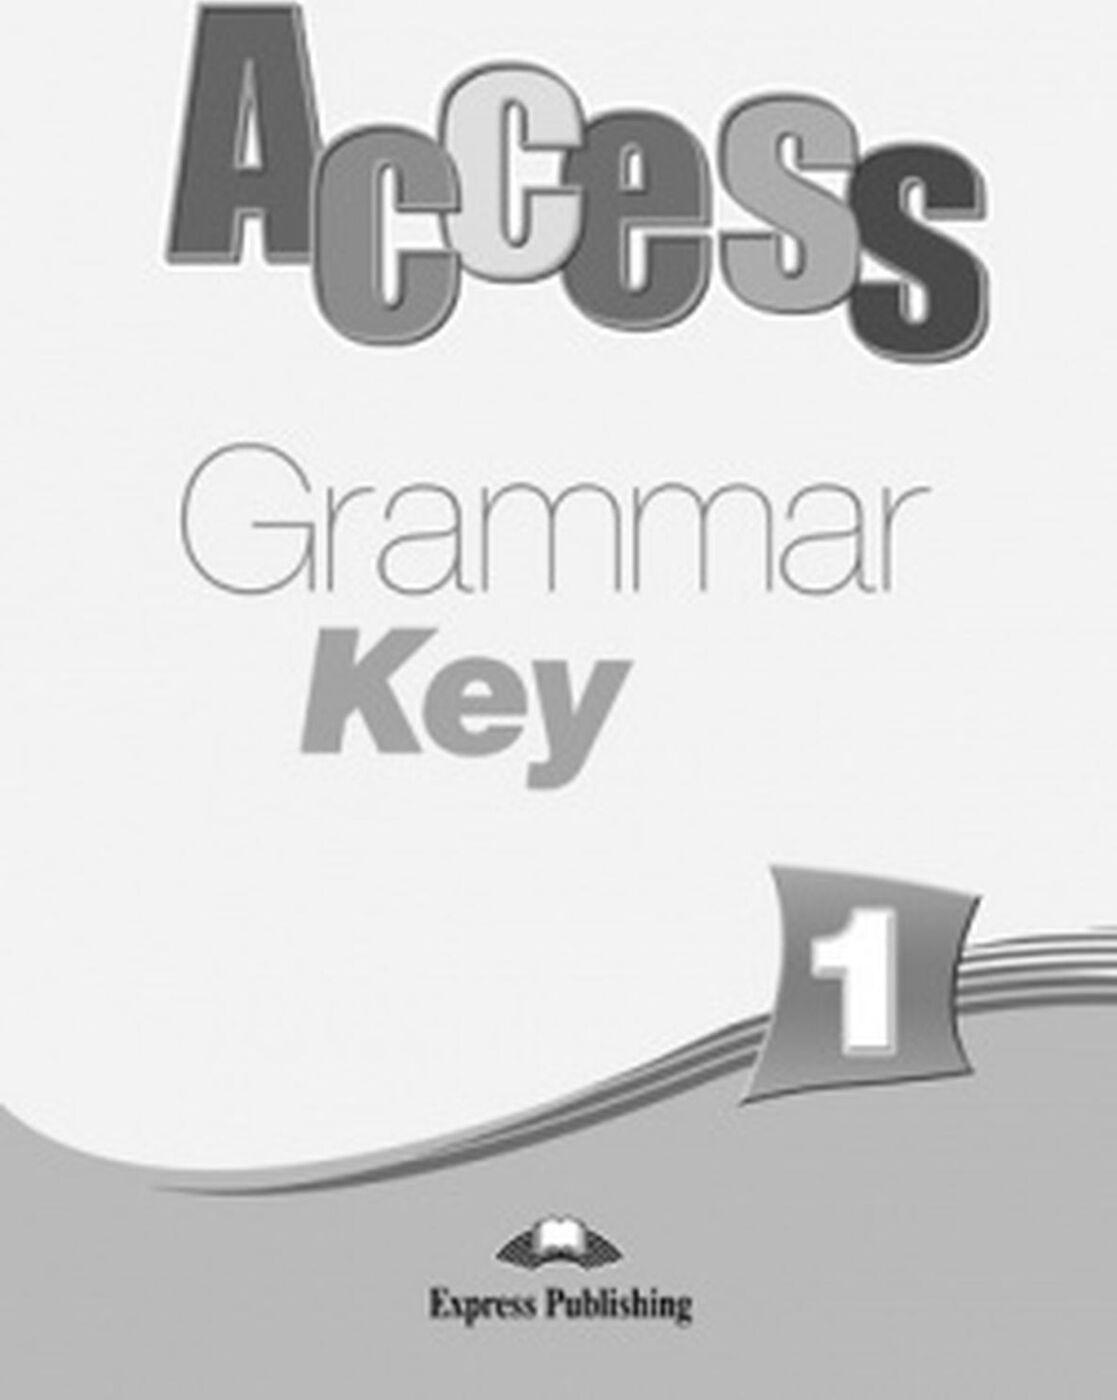 Virginia Evans, Jenny Dooley. Access 1: Grammar Key | Дули Дженни, Эванс Вирджиния